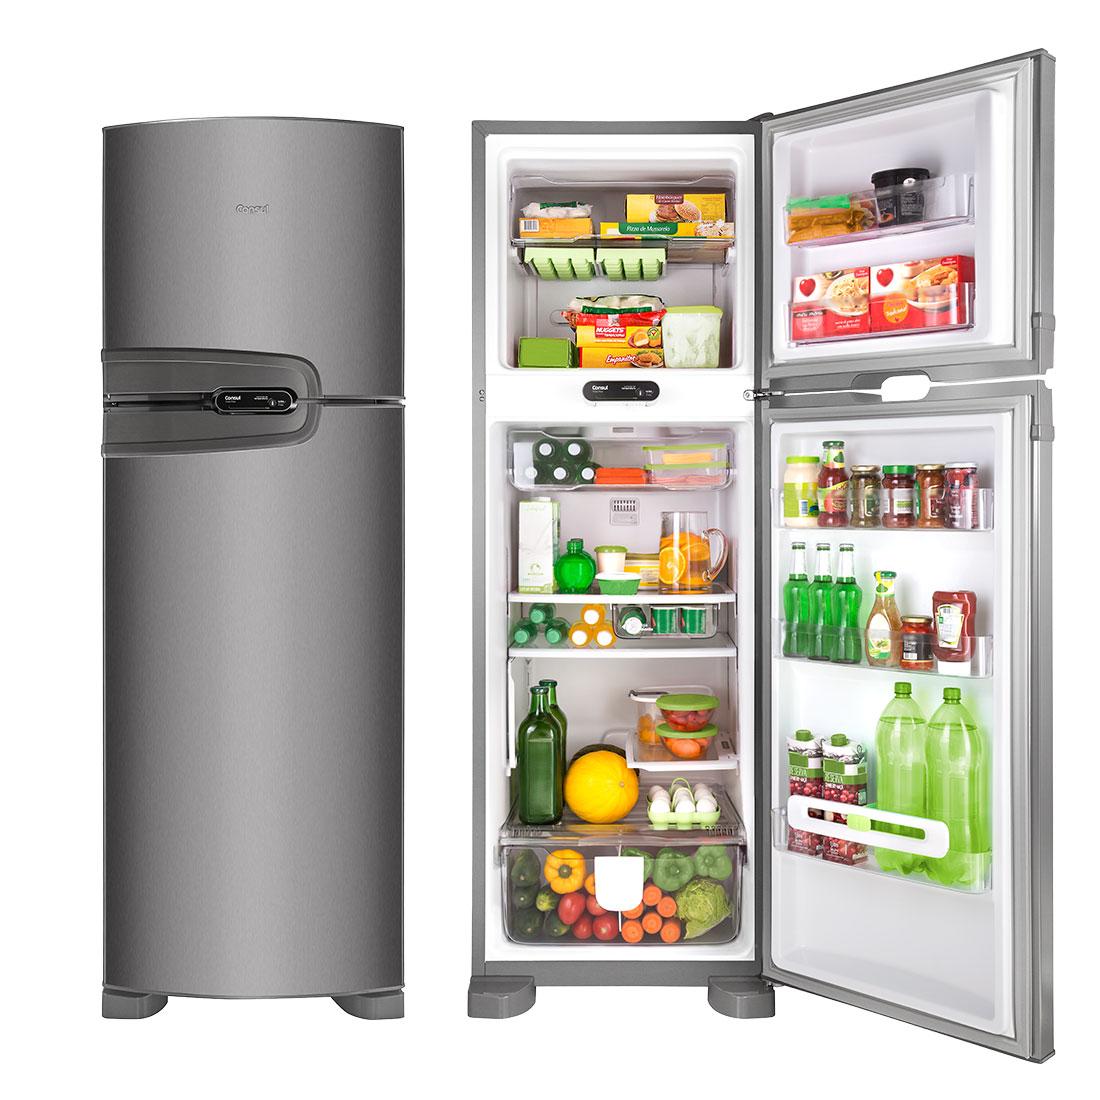 geladeira consul modelo duplex